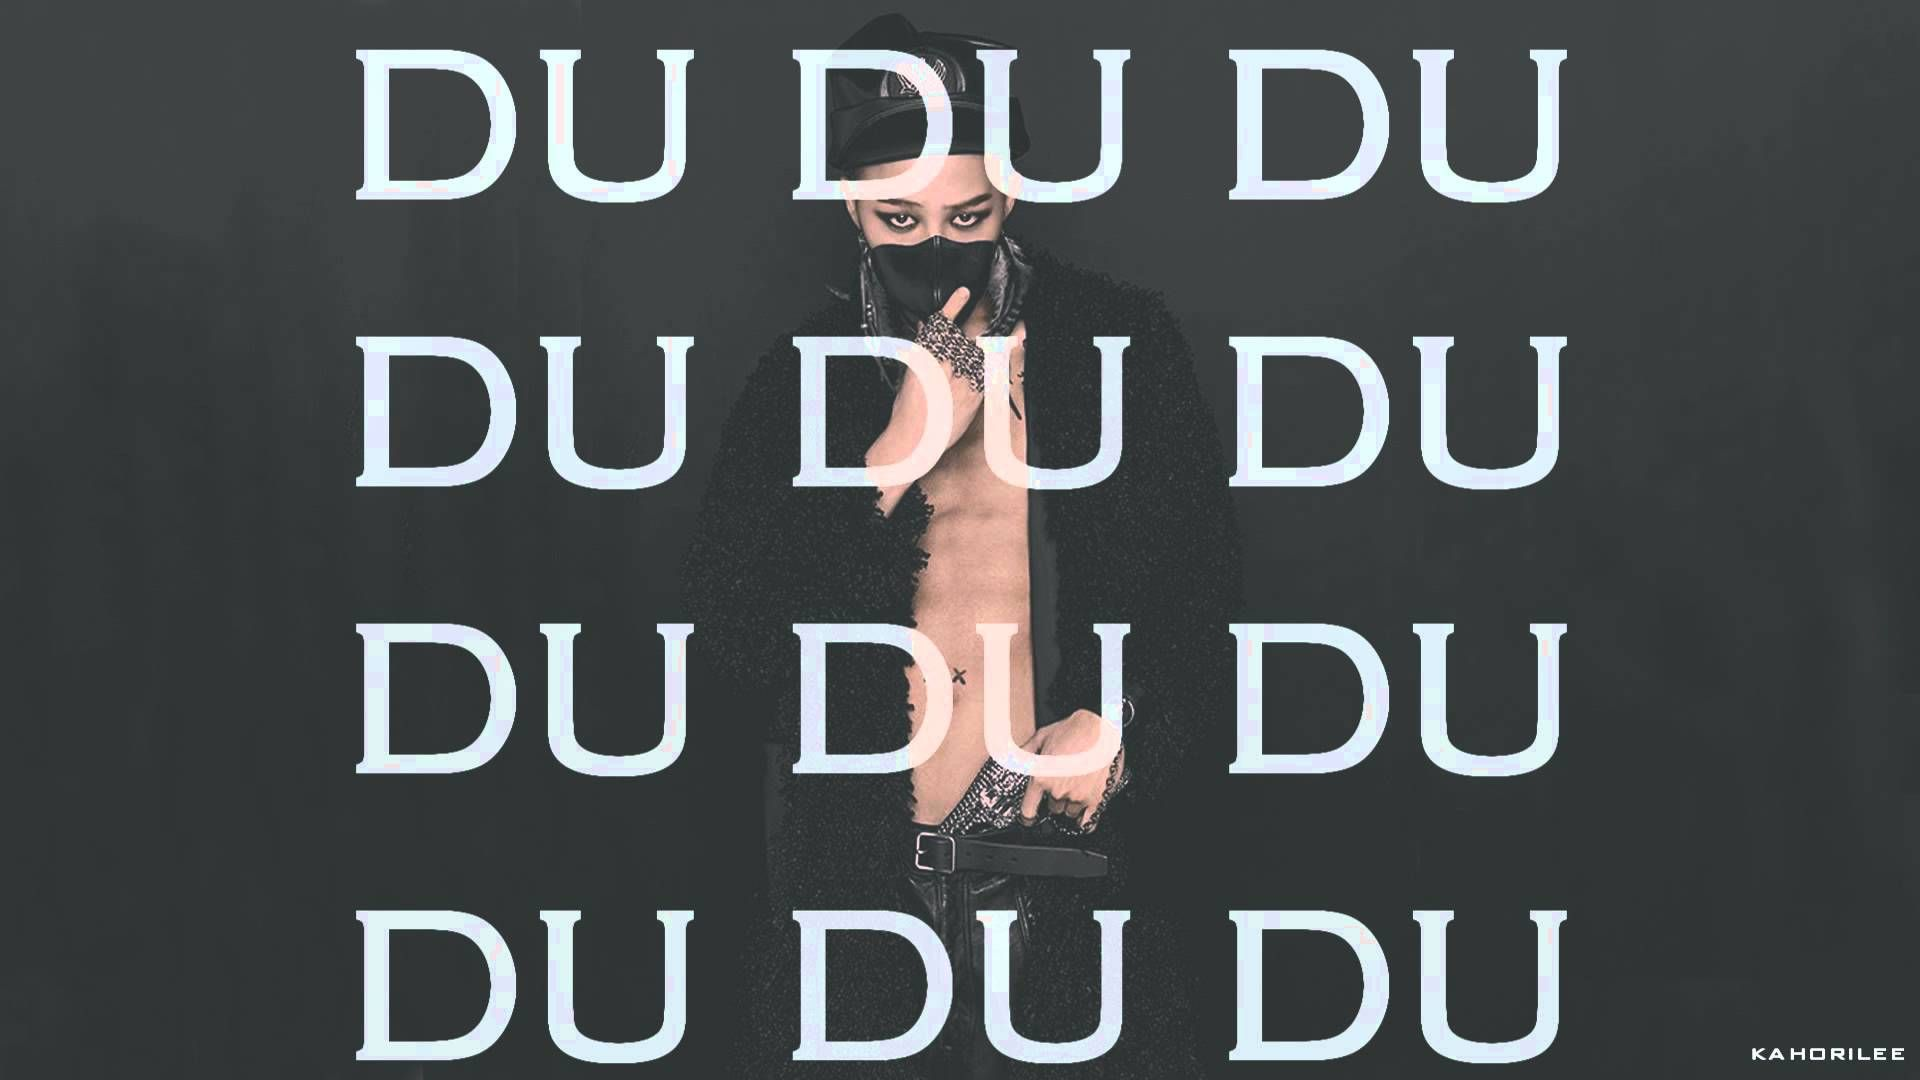 Who You? (니가 뭔데) - G-Dragon  (지드래곤) [Romanized, Hangul, English] Lyrics